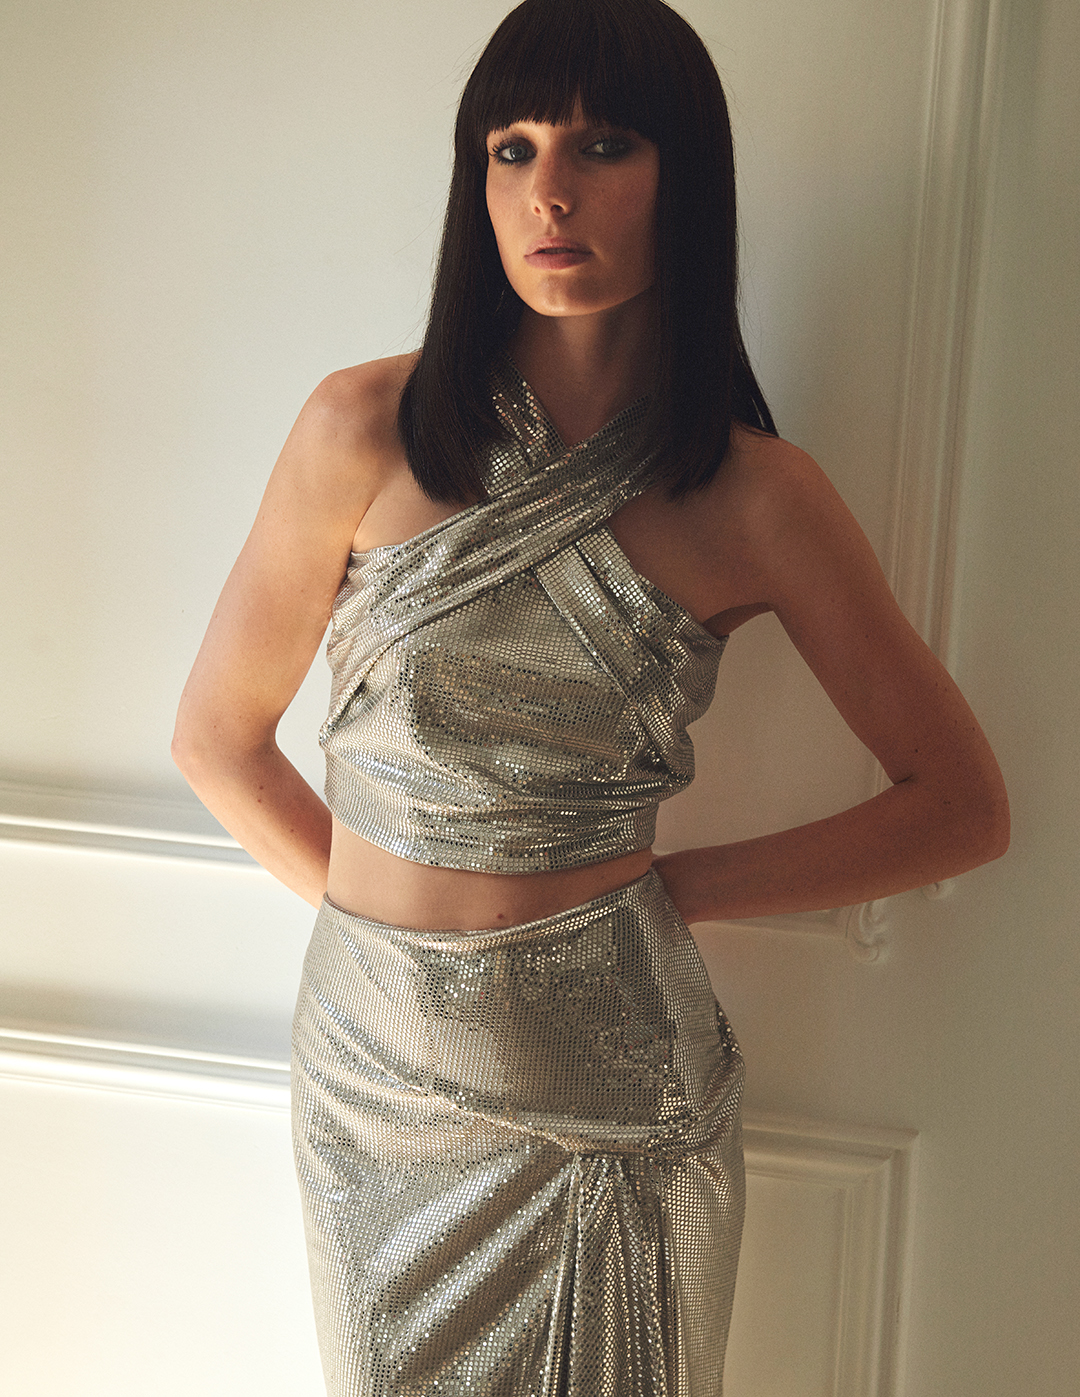 Demy de Vries - Daniel Scheel - Fashion - Editorial - Instyle - Francesca Rinciari - 8AM - 8 Artist Management